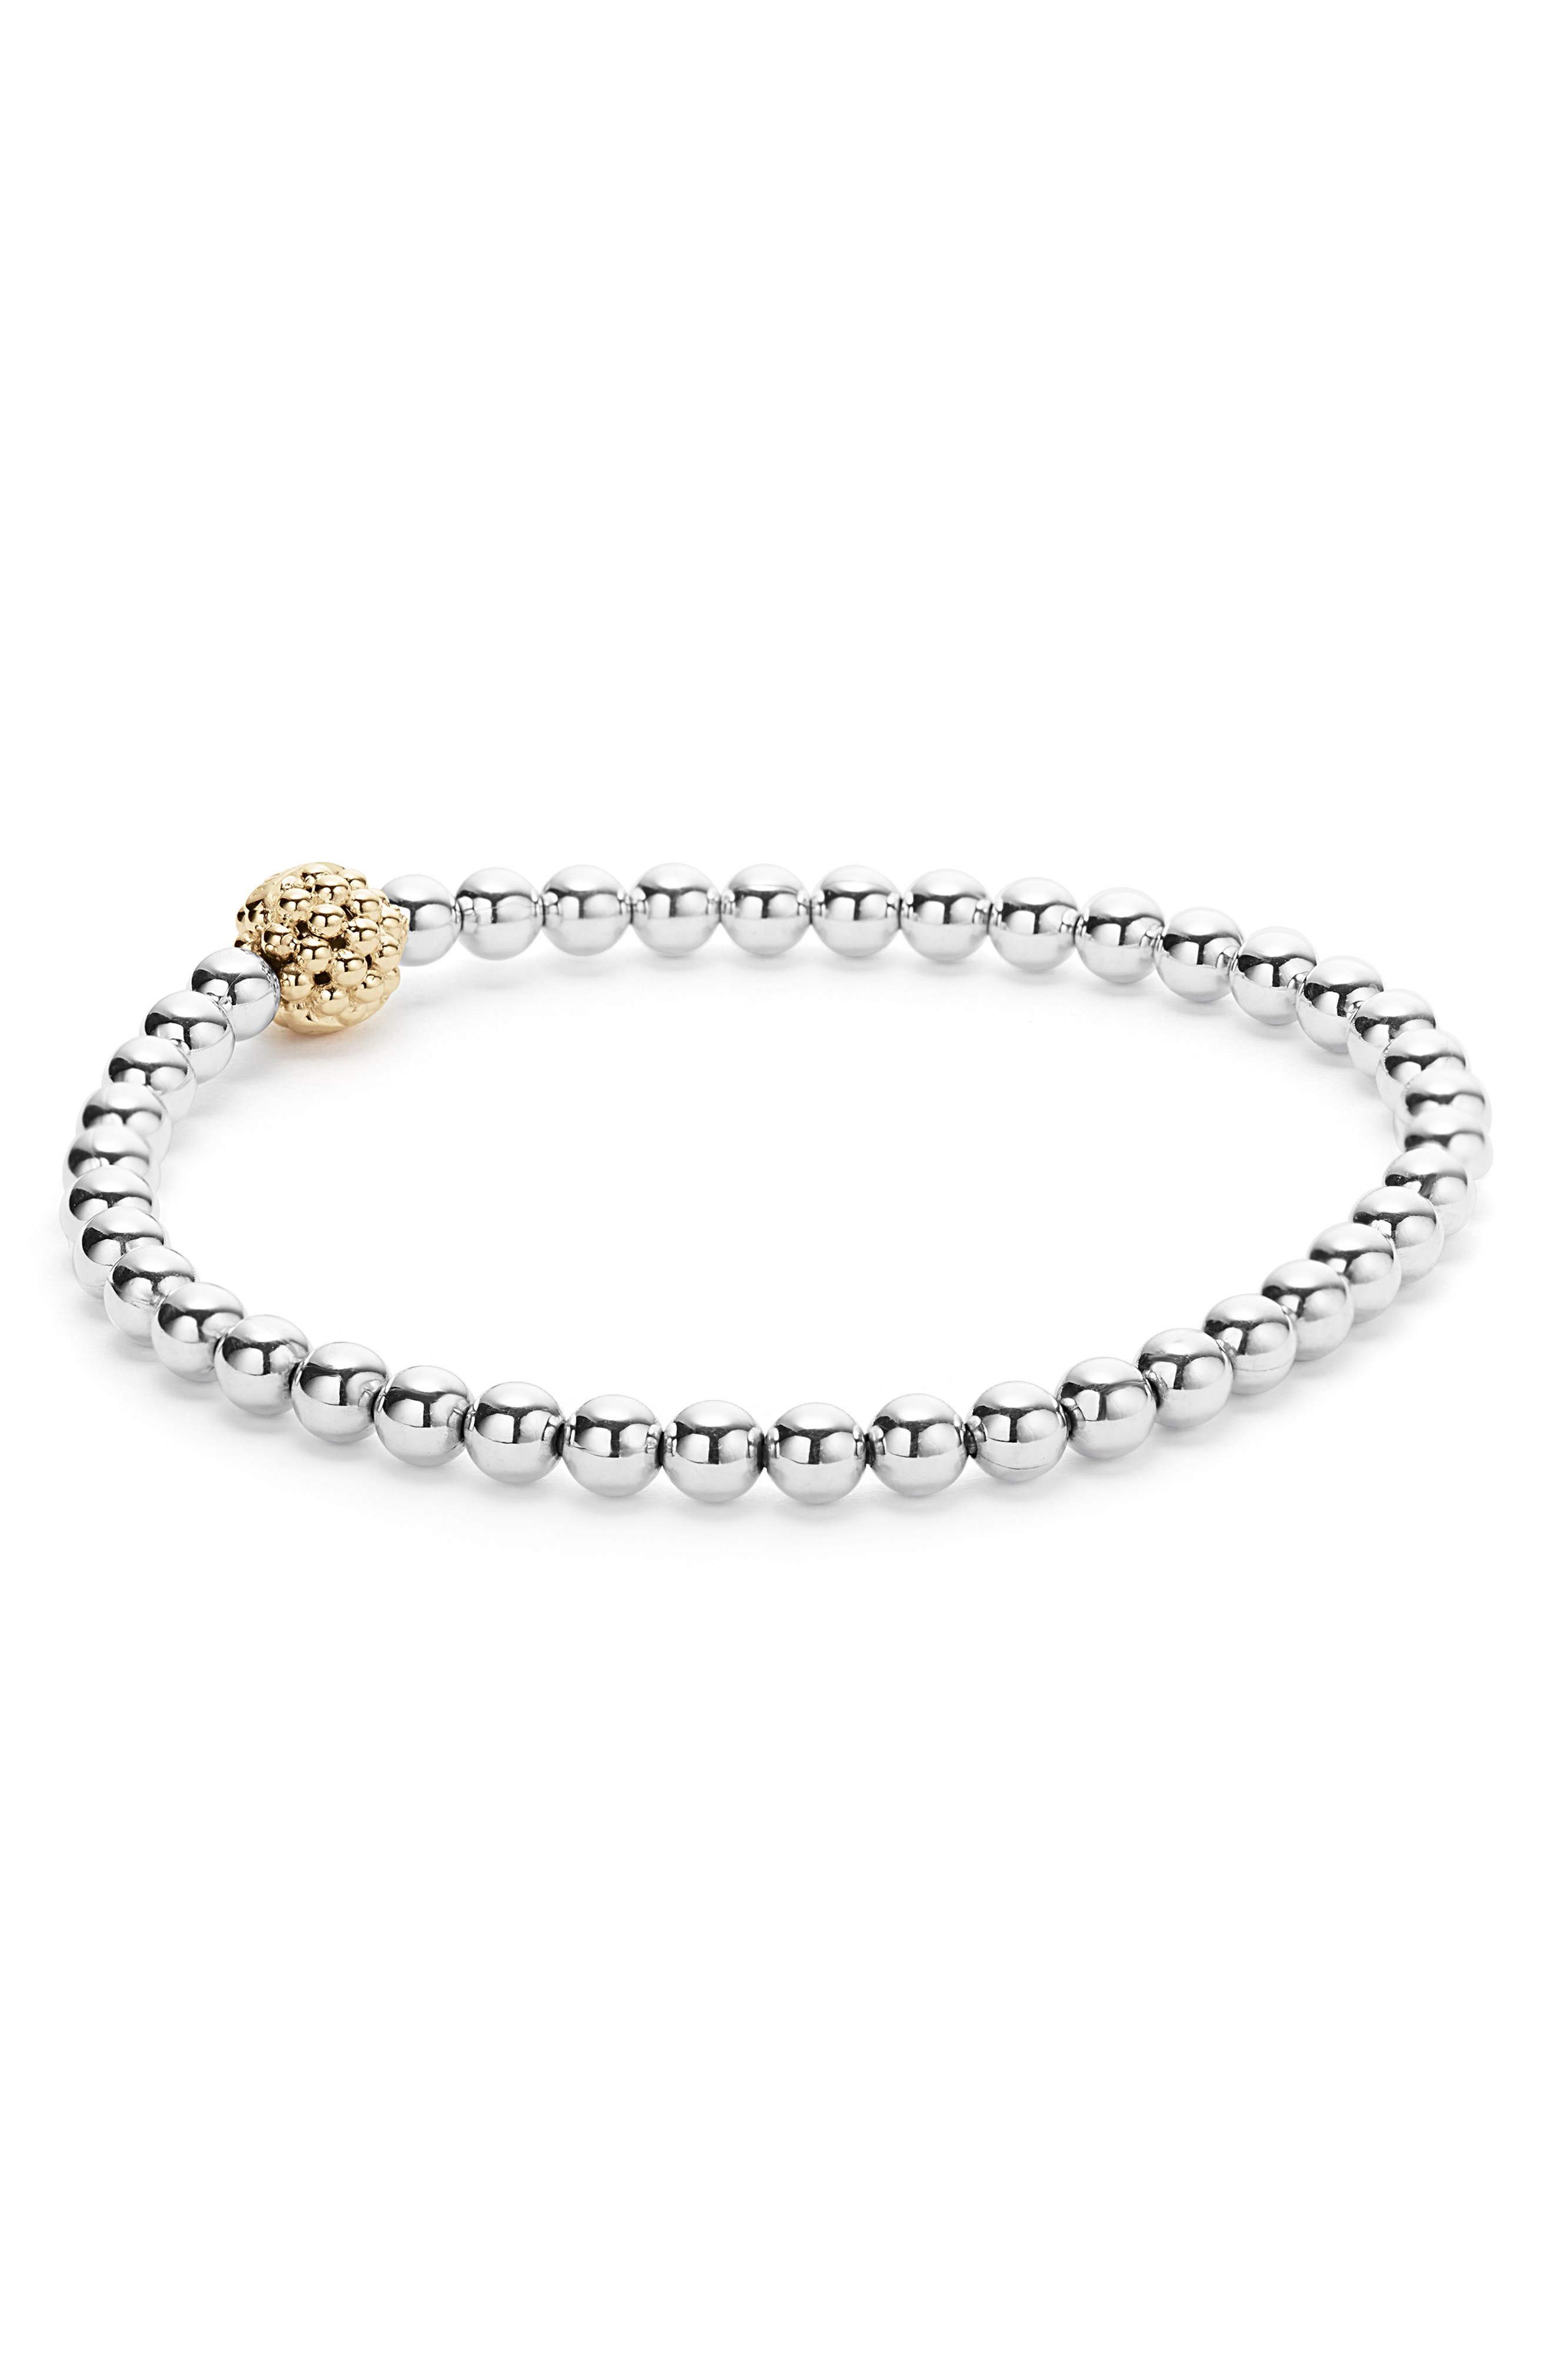 Caviar Icon Ball Bracelet,                             Alternate thumbnail 4, color,                             SILVER/ GOLD BALL